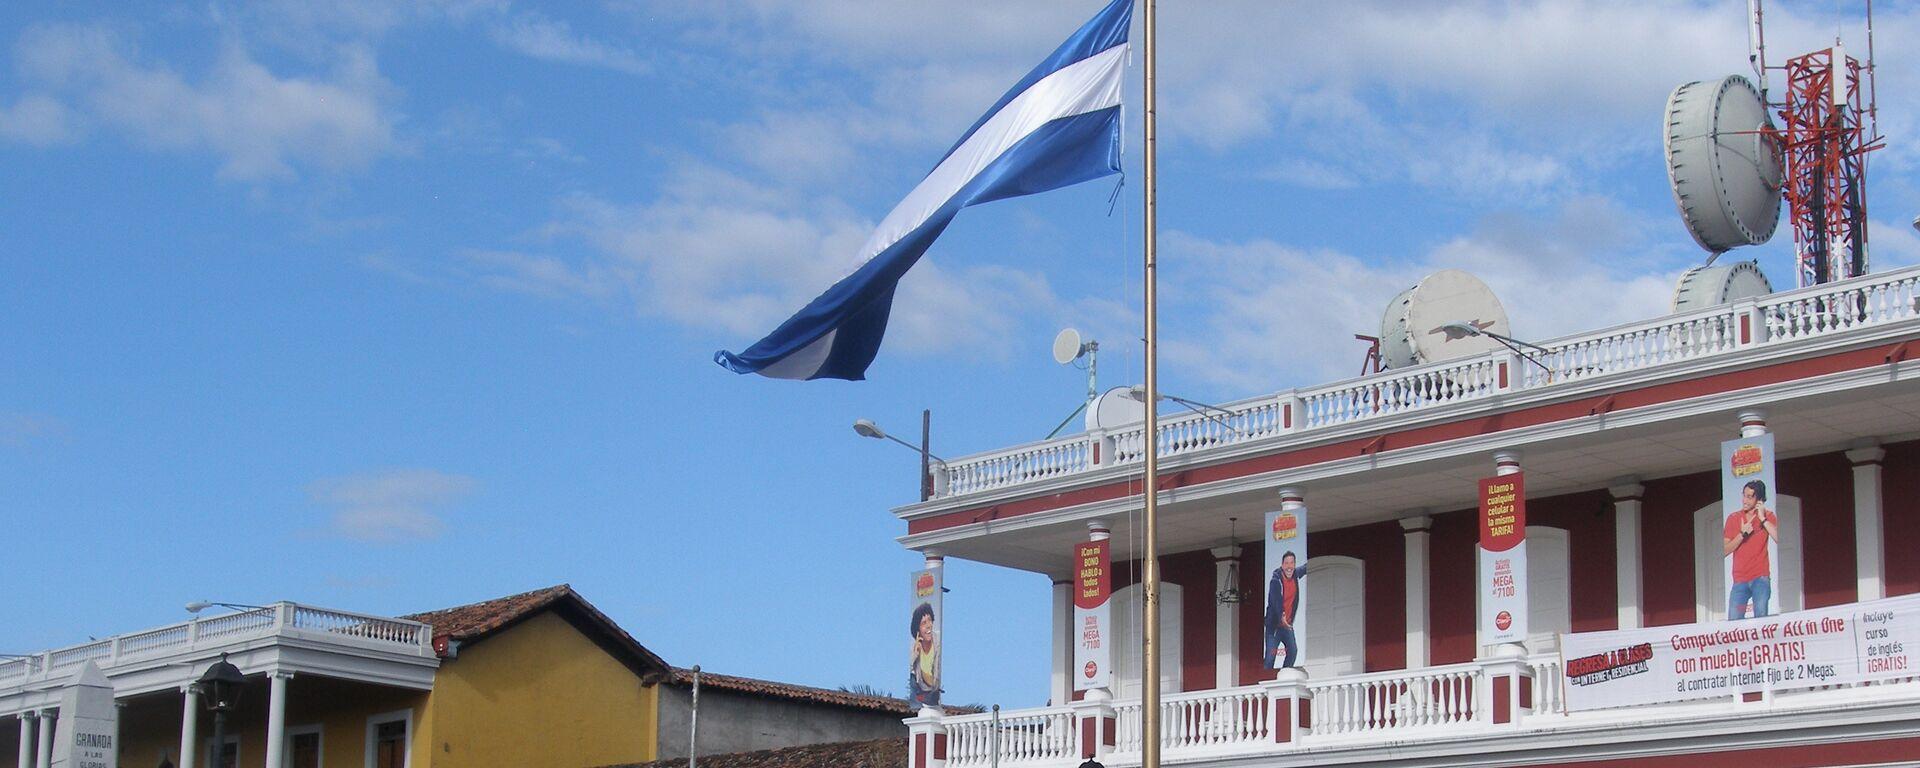 Bandera de Nicaragua  - Sputnik Mundo, 1920, 11.05.2021